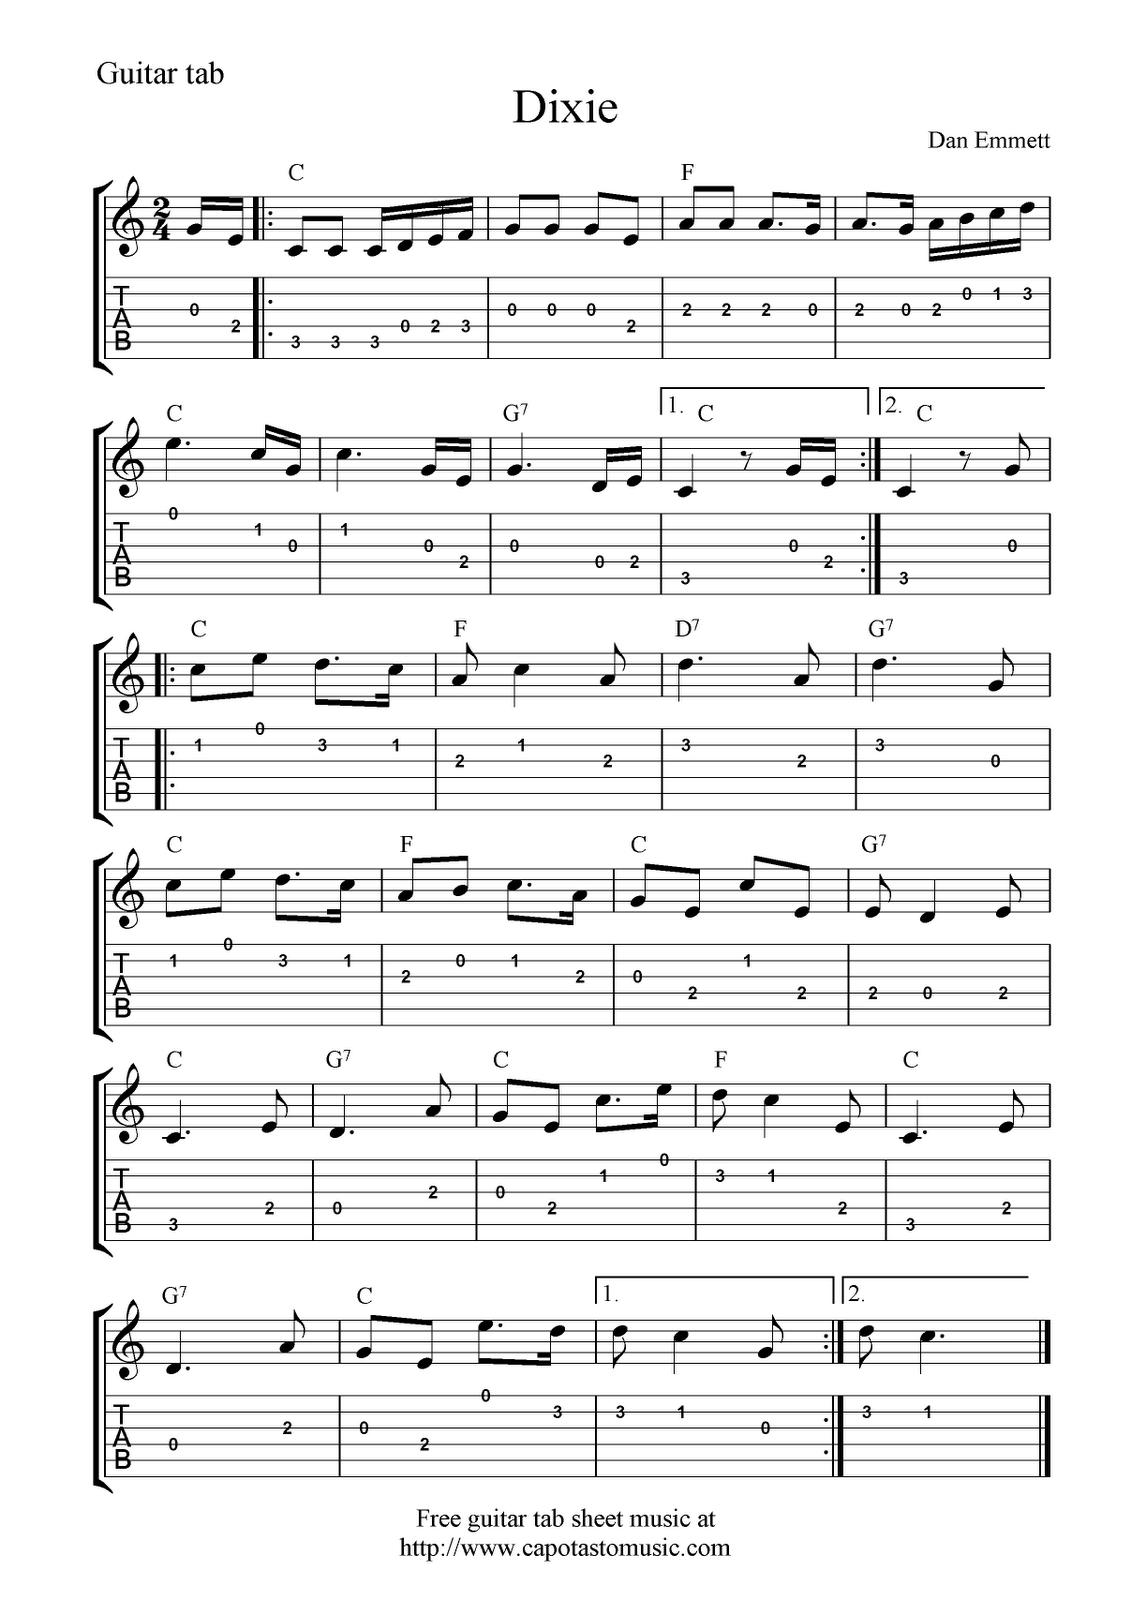 Guitar Music Sheets For Beginners | Free Guitar Tab Sheet Music - Free Guitar Sheet Music For Popular Songs Printable